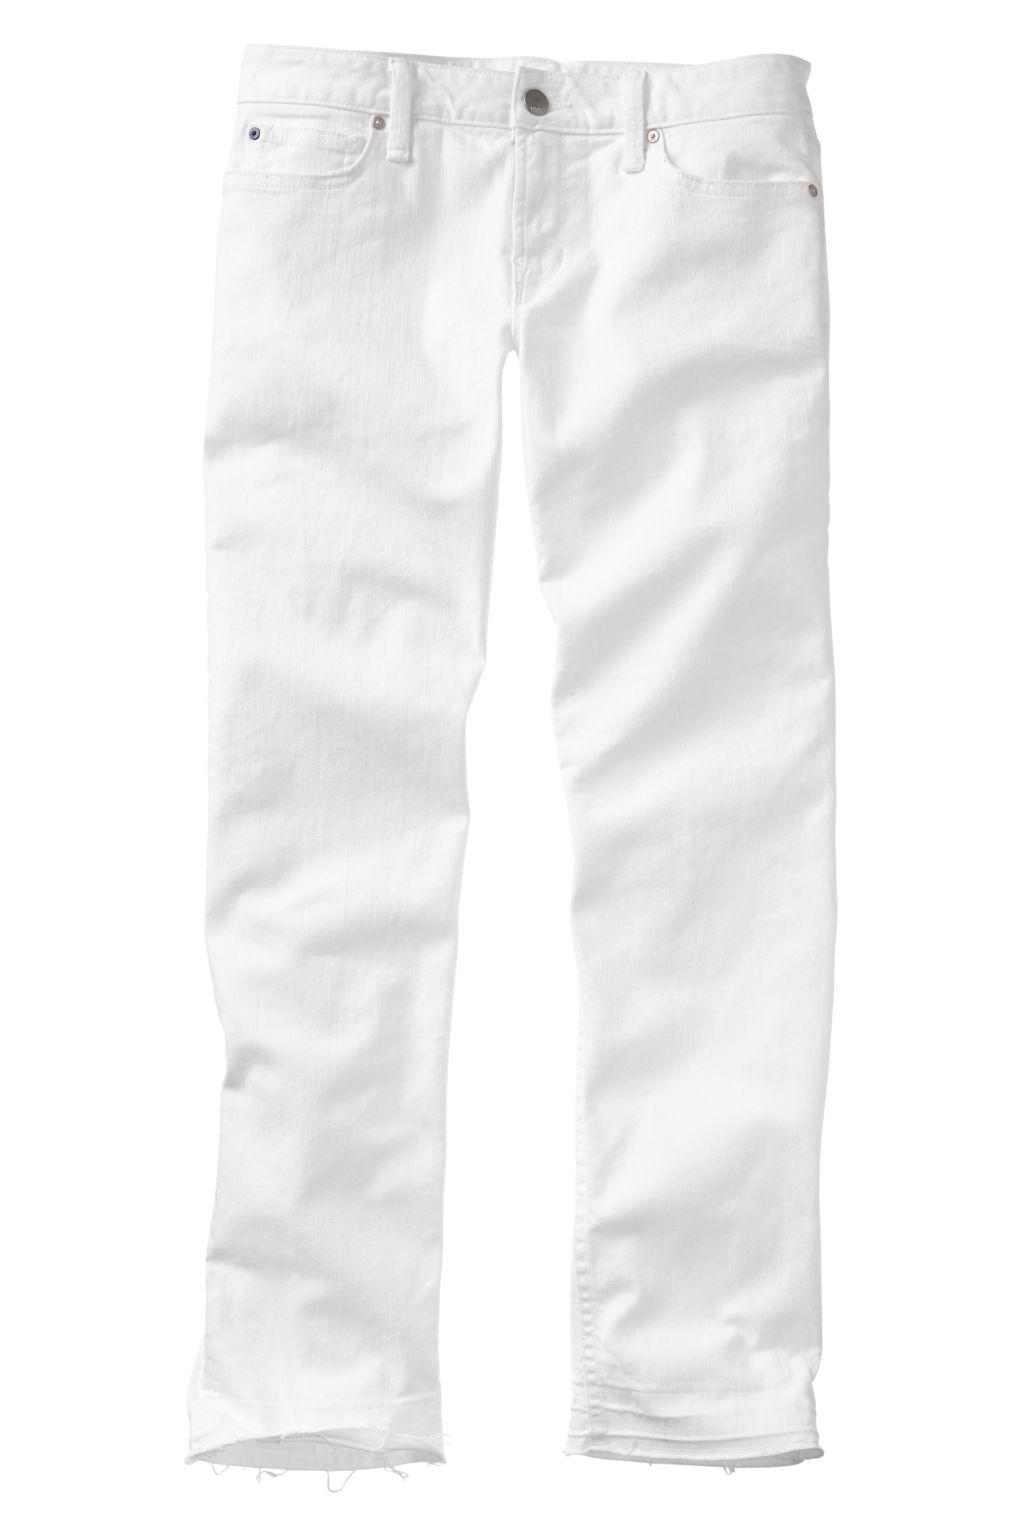 Book Cover White Jeans : White denim best jeans